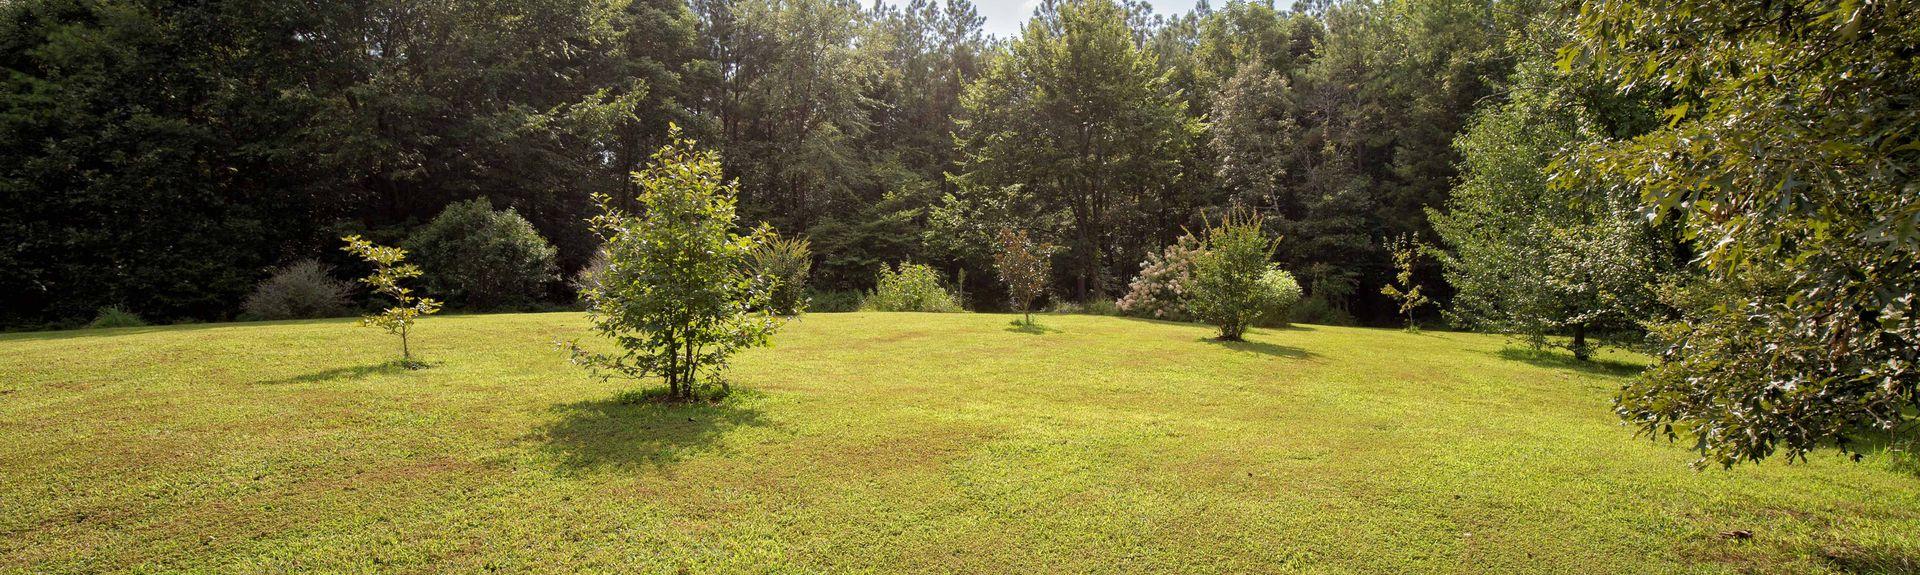 Powhatan County, VA, USA